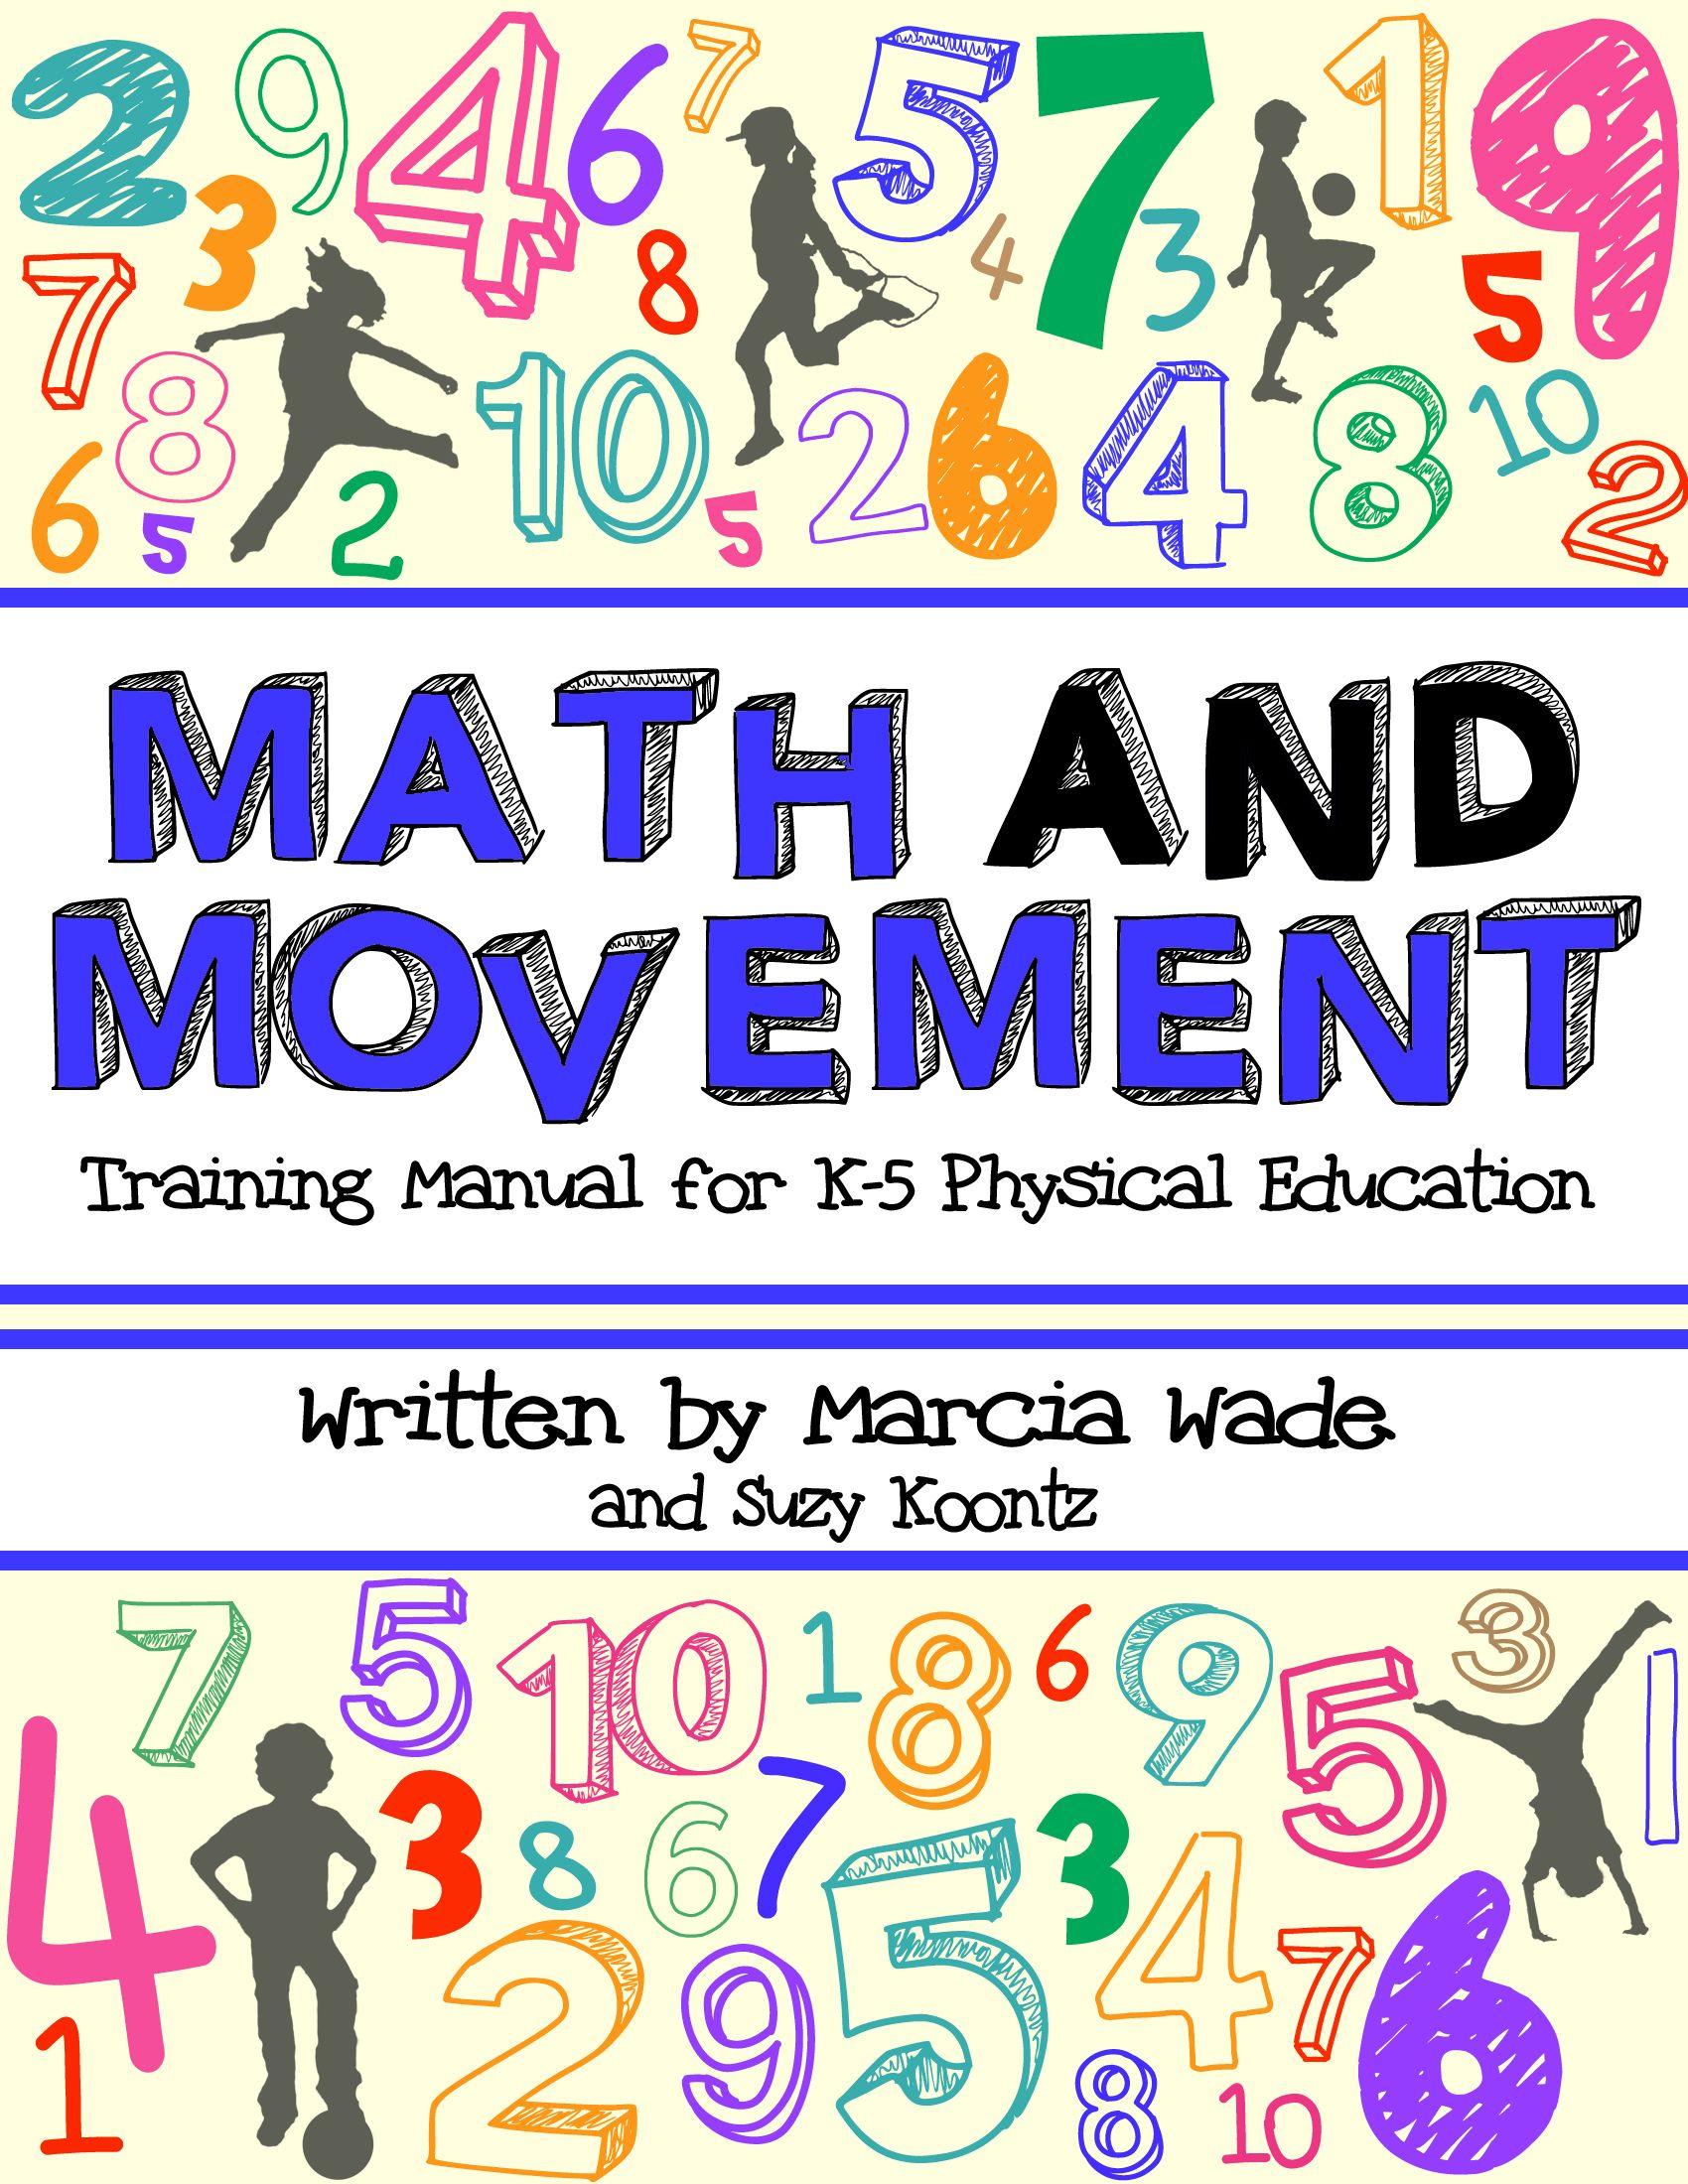 Teach Math In Physical Education Class